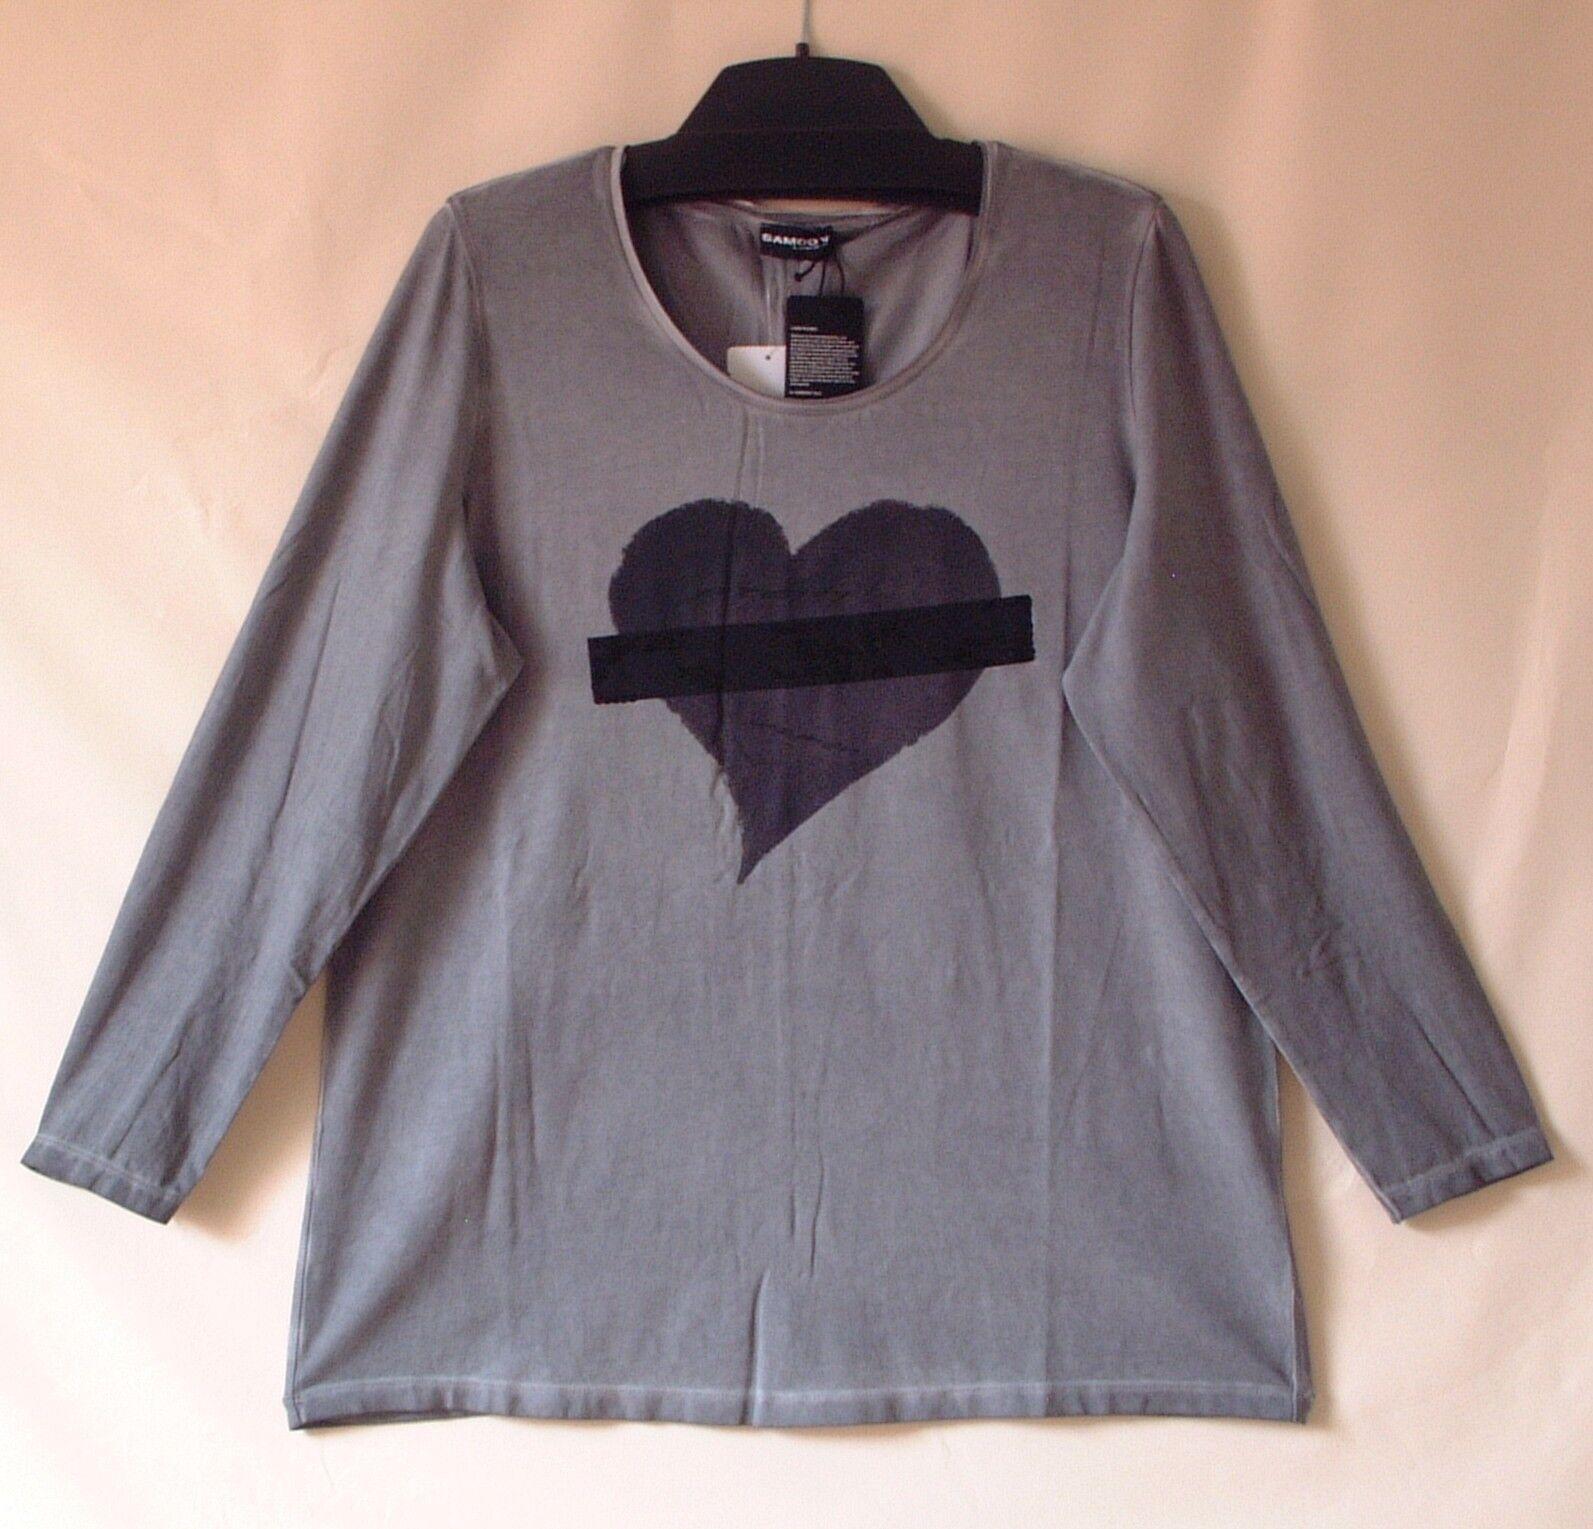 Samoon Shirt Gerry Weber Vintage Style Herzprint mit Pailletten grau Neu Gr.48